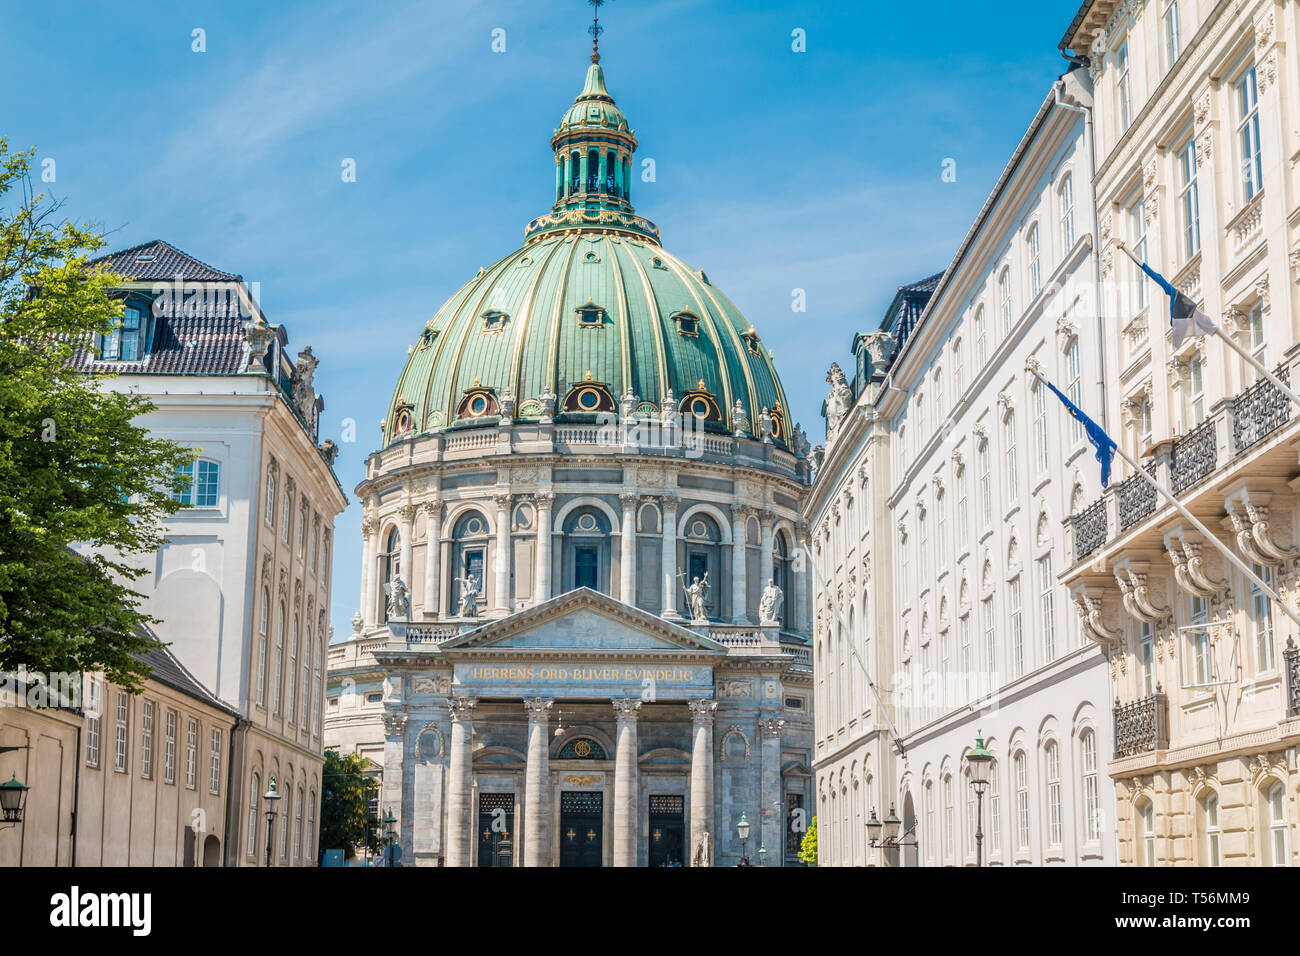 The Marble church in Copenhagen - Stock Image